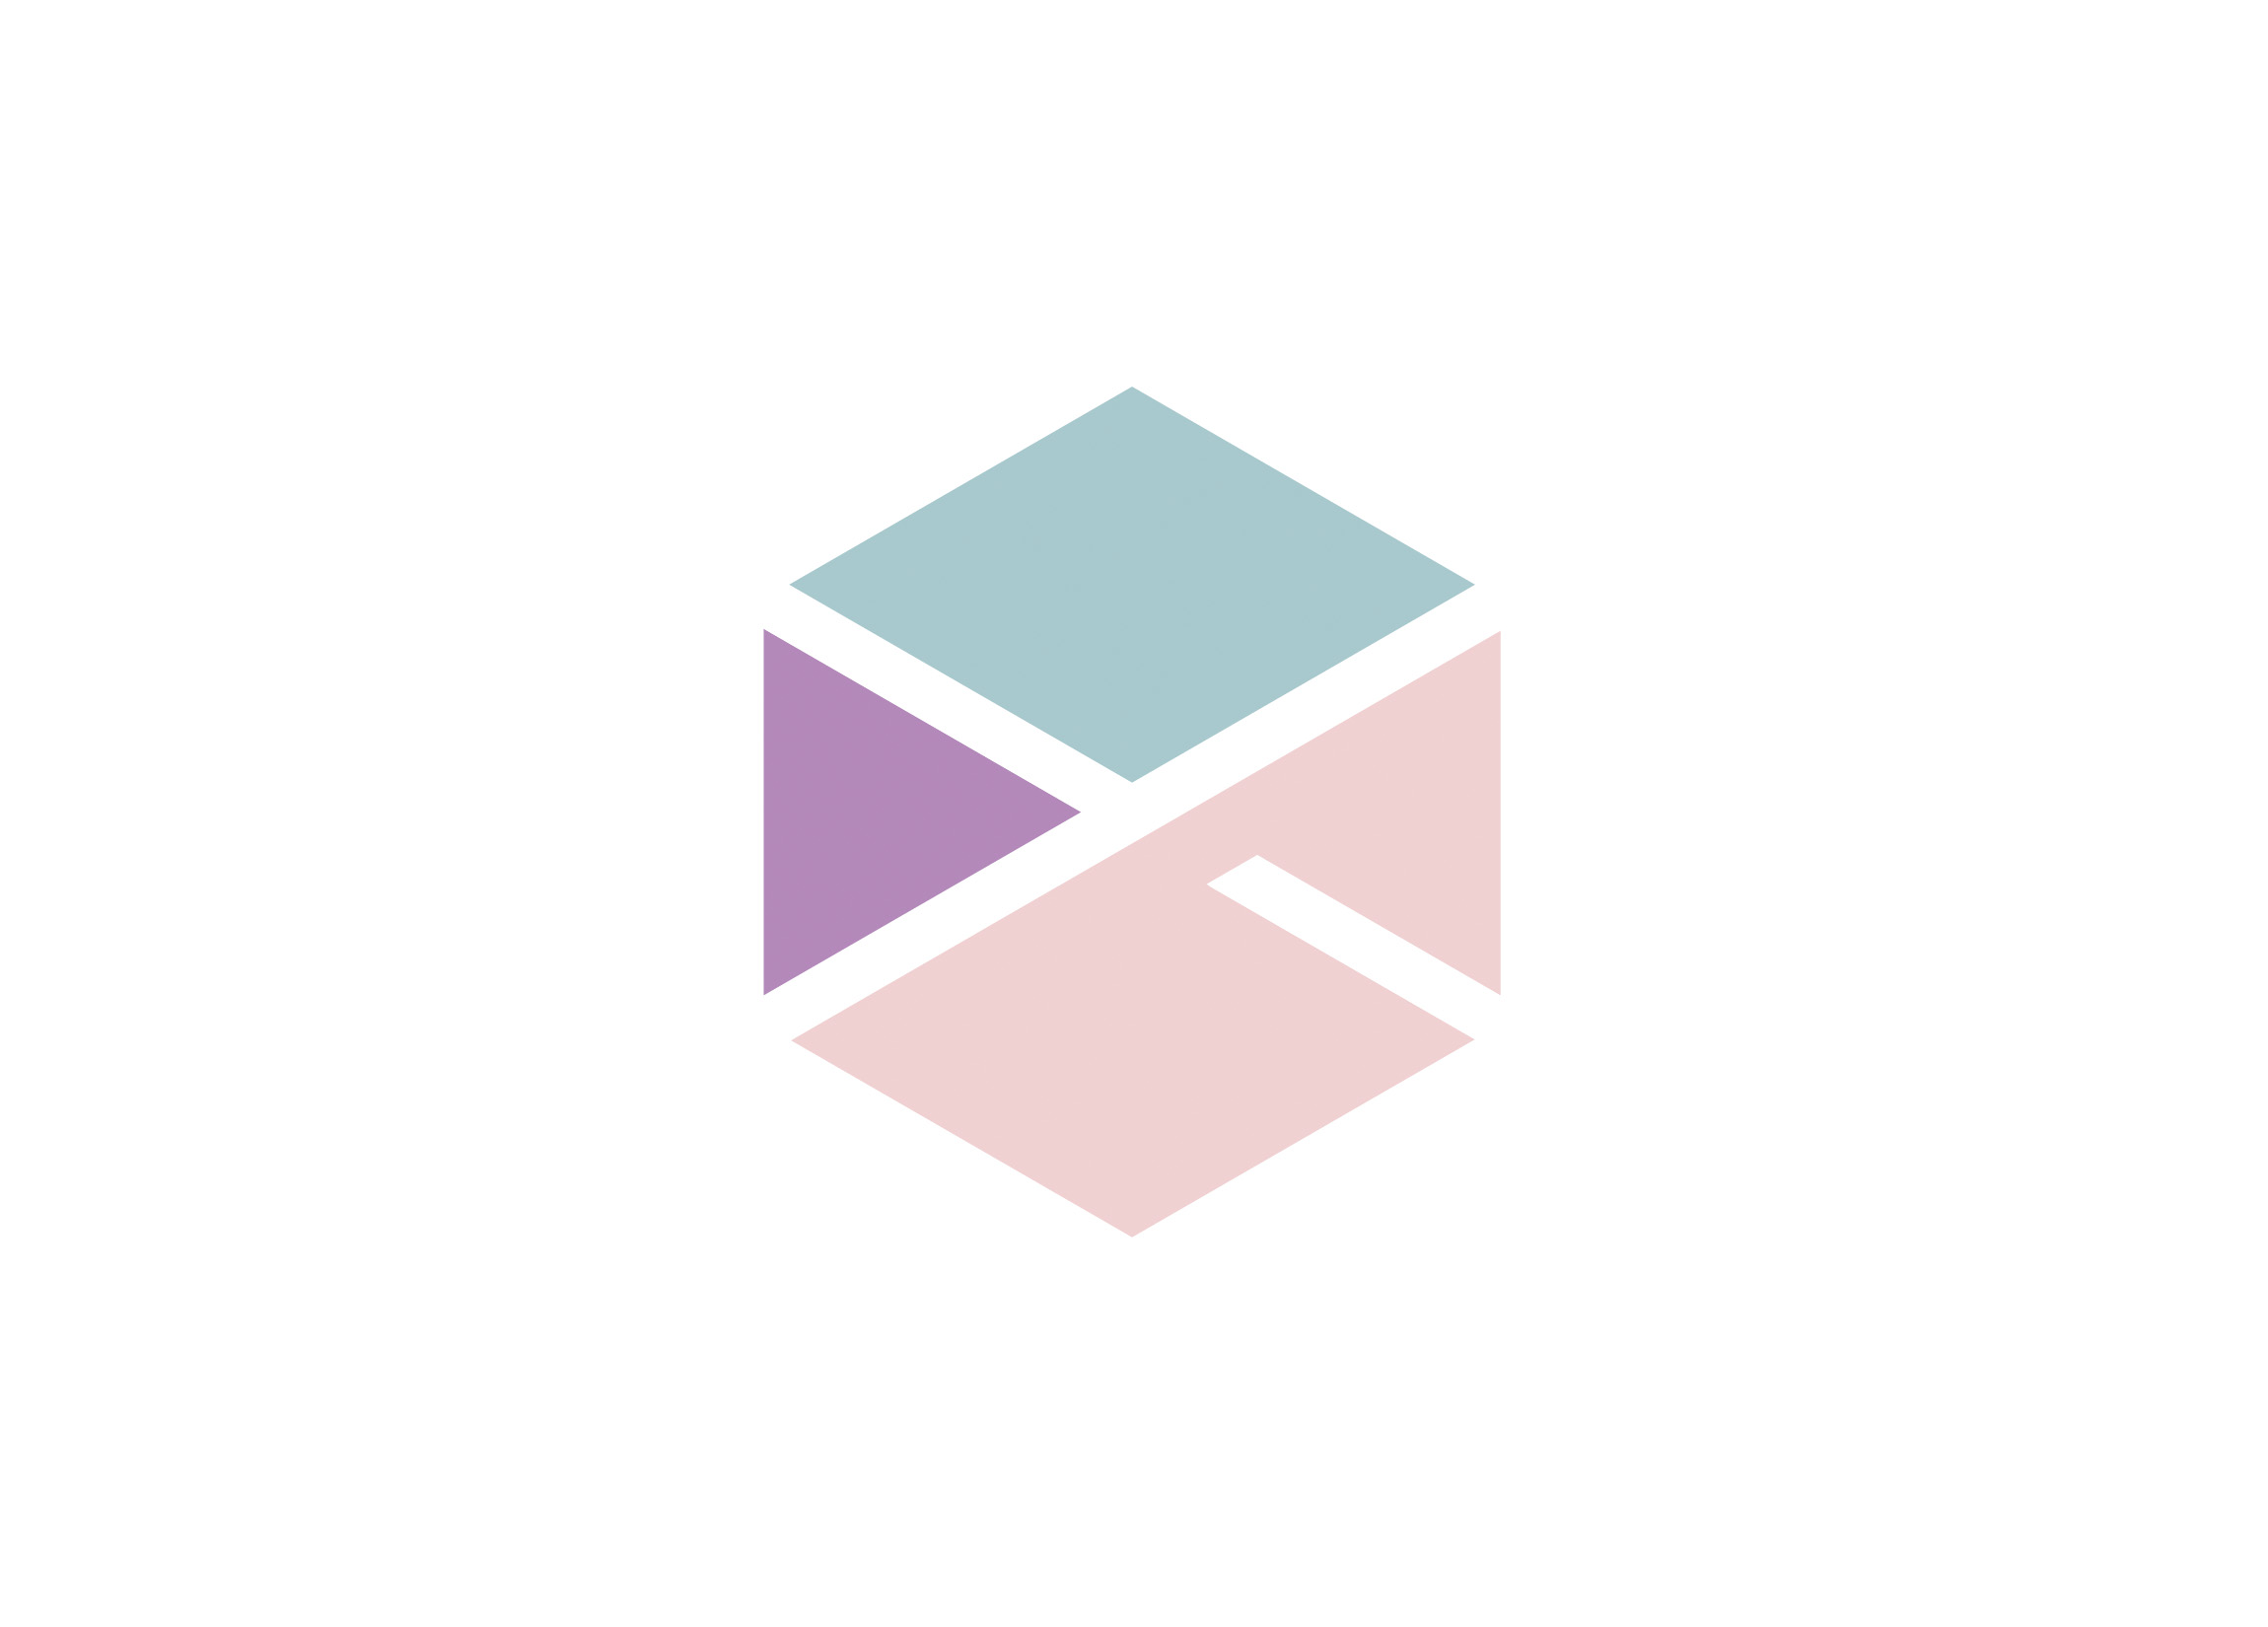 Rosara_Logos04.jpg